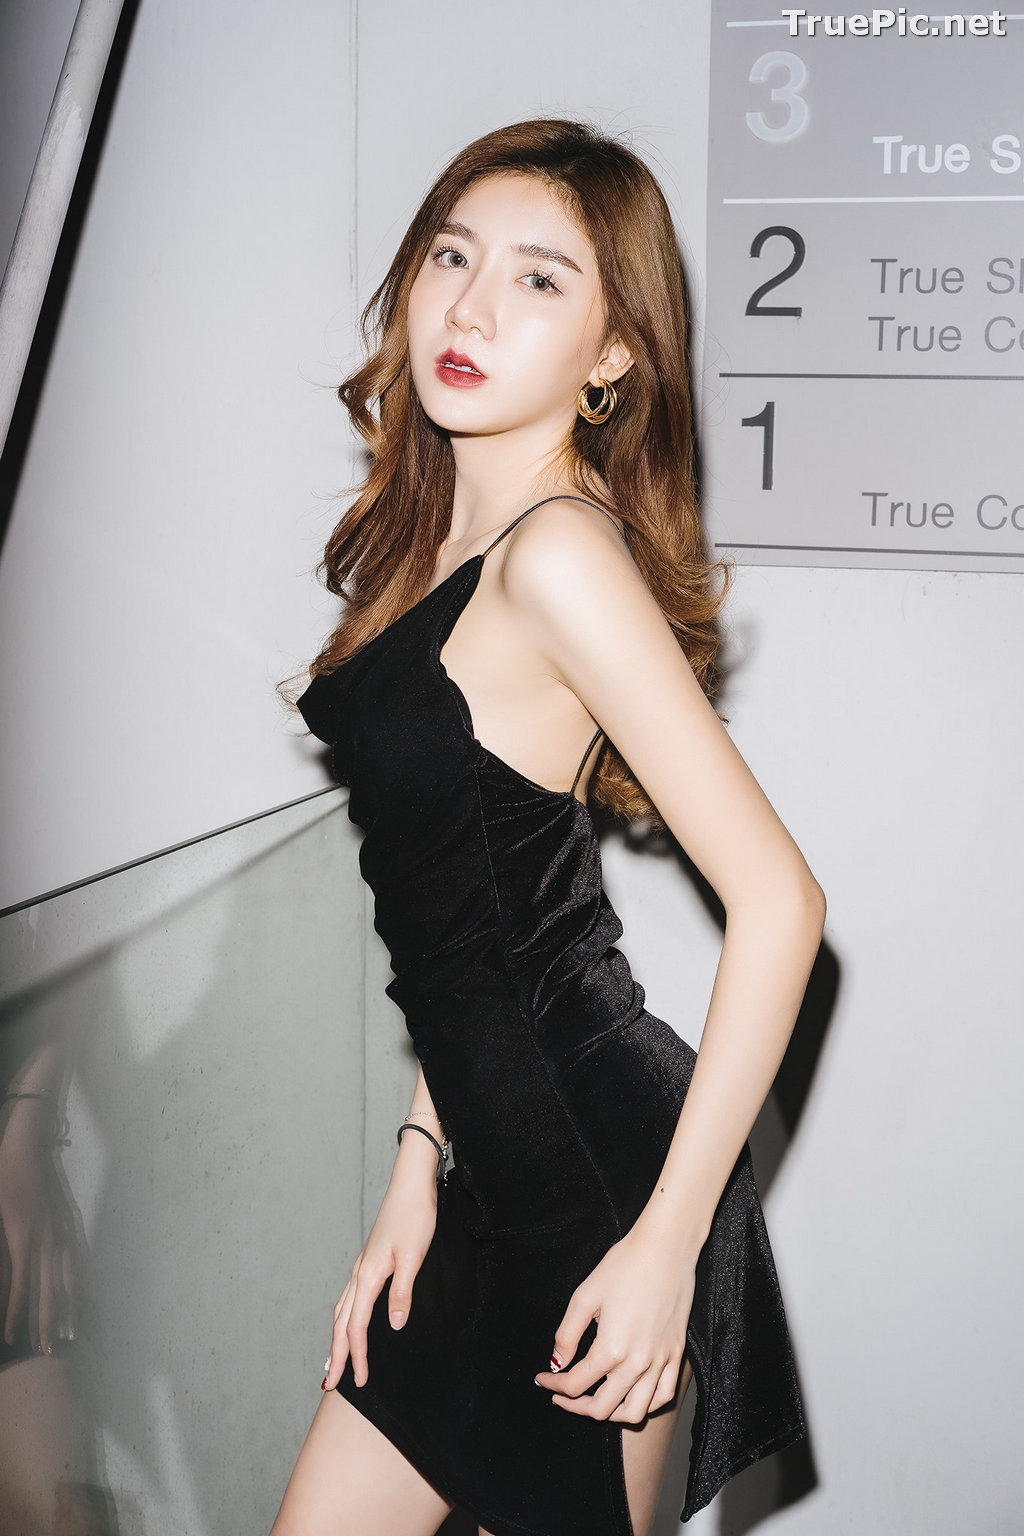 Image Thailand Model - Sasi Ngiunwan - Black For SiamNight - TruePic.net - Picture-28